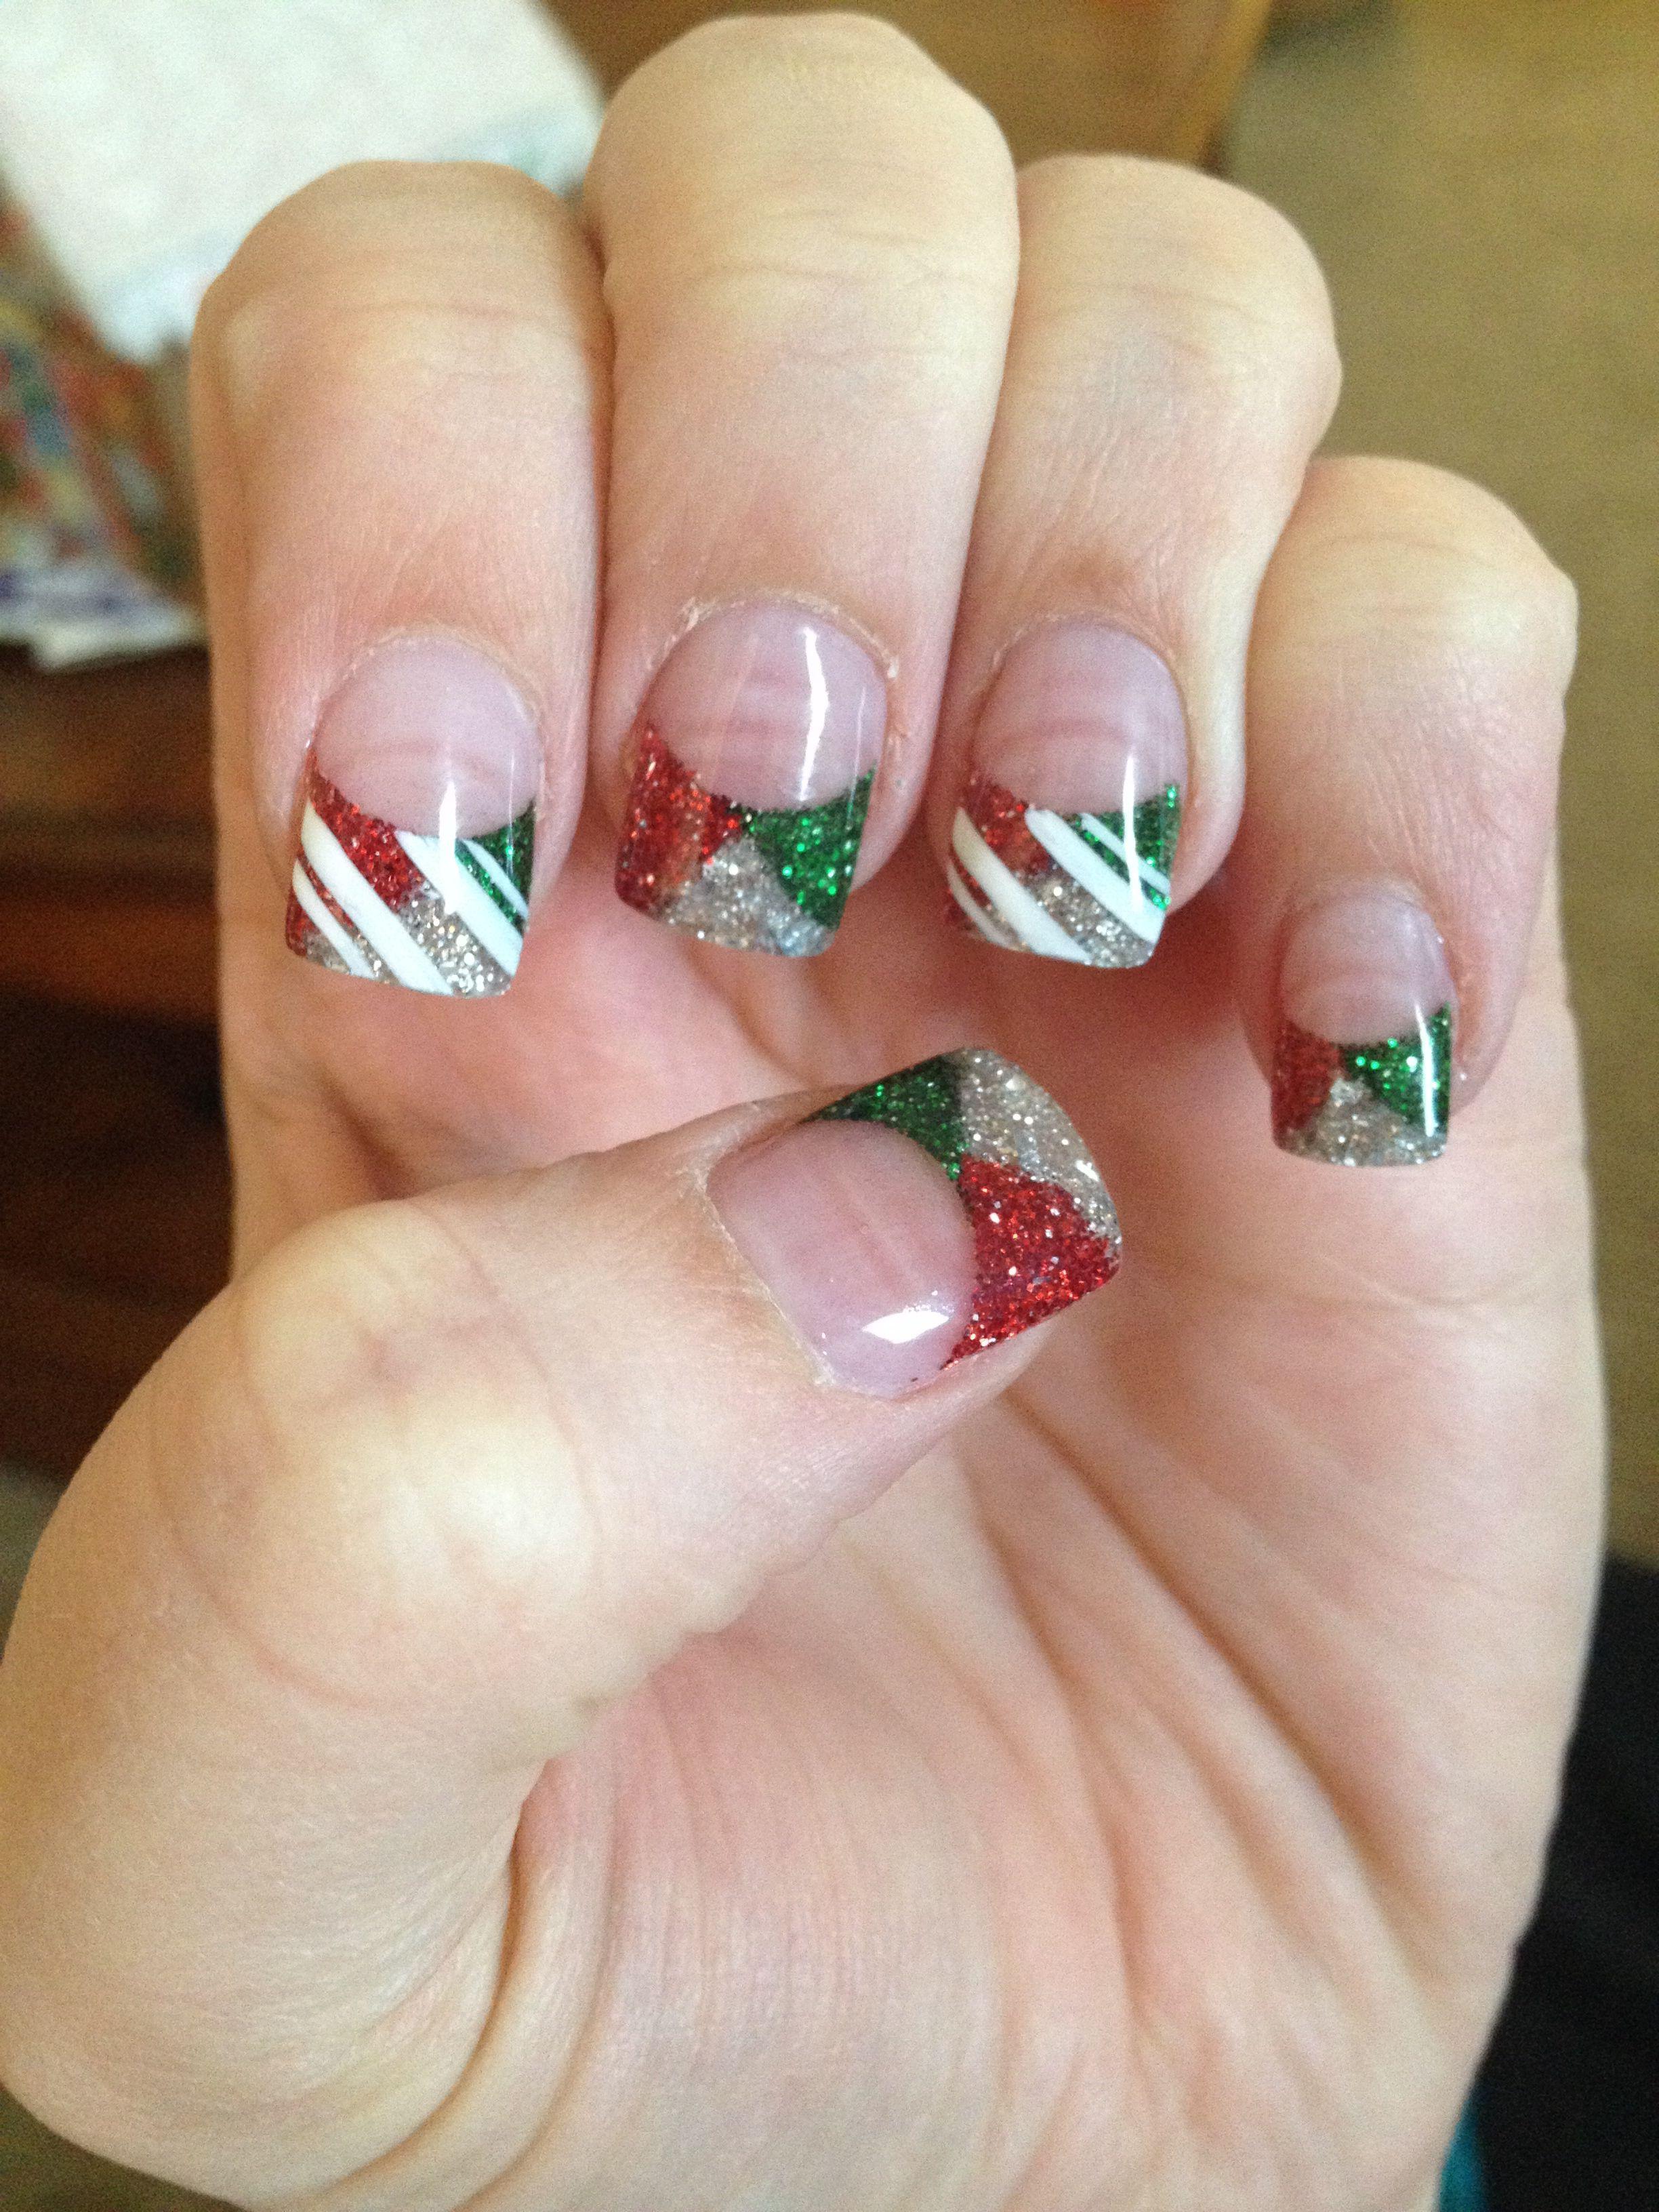 My Christmas Nails 2013 Christmas Nails Diy Christmas Nail Art Designs Christmas Nails